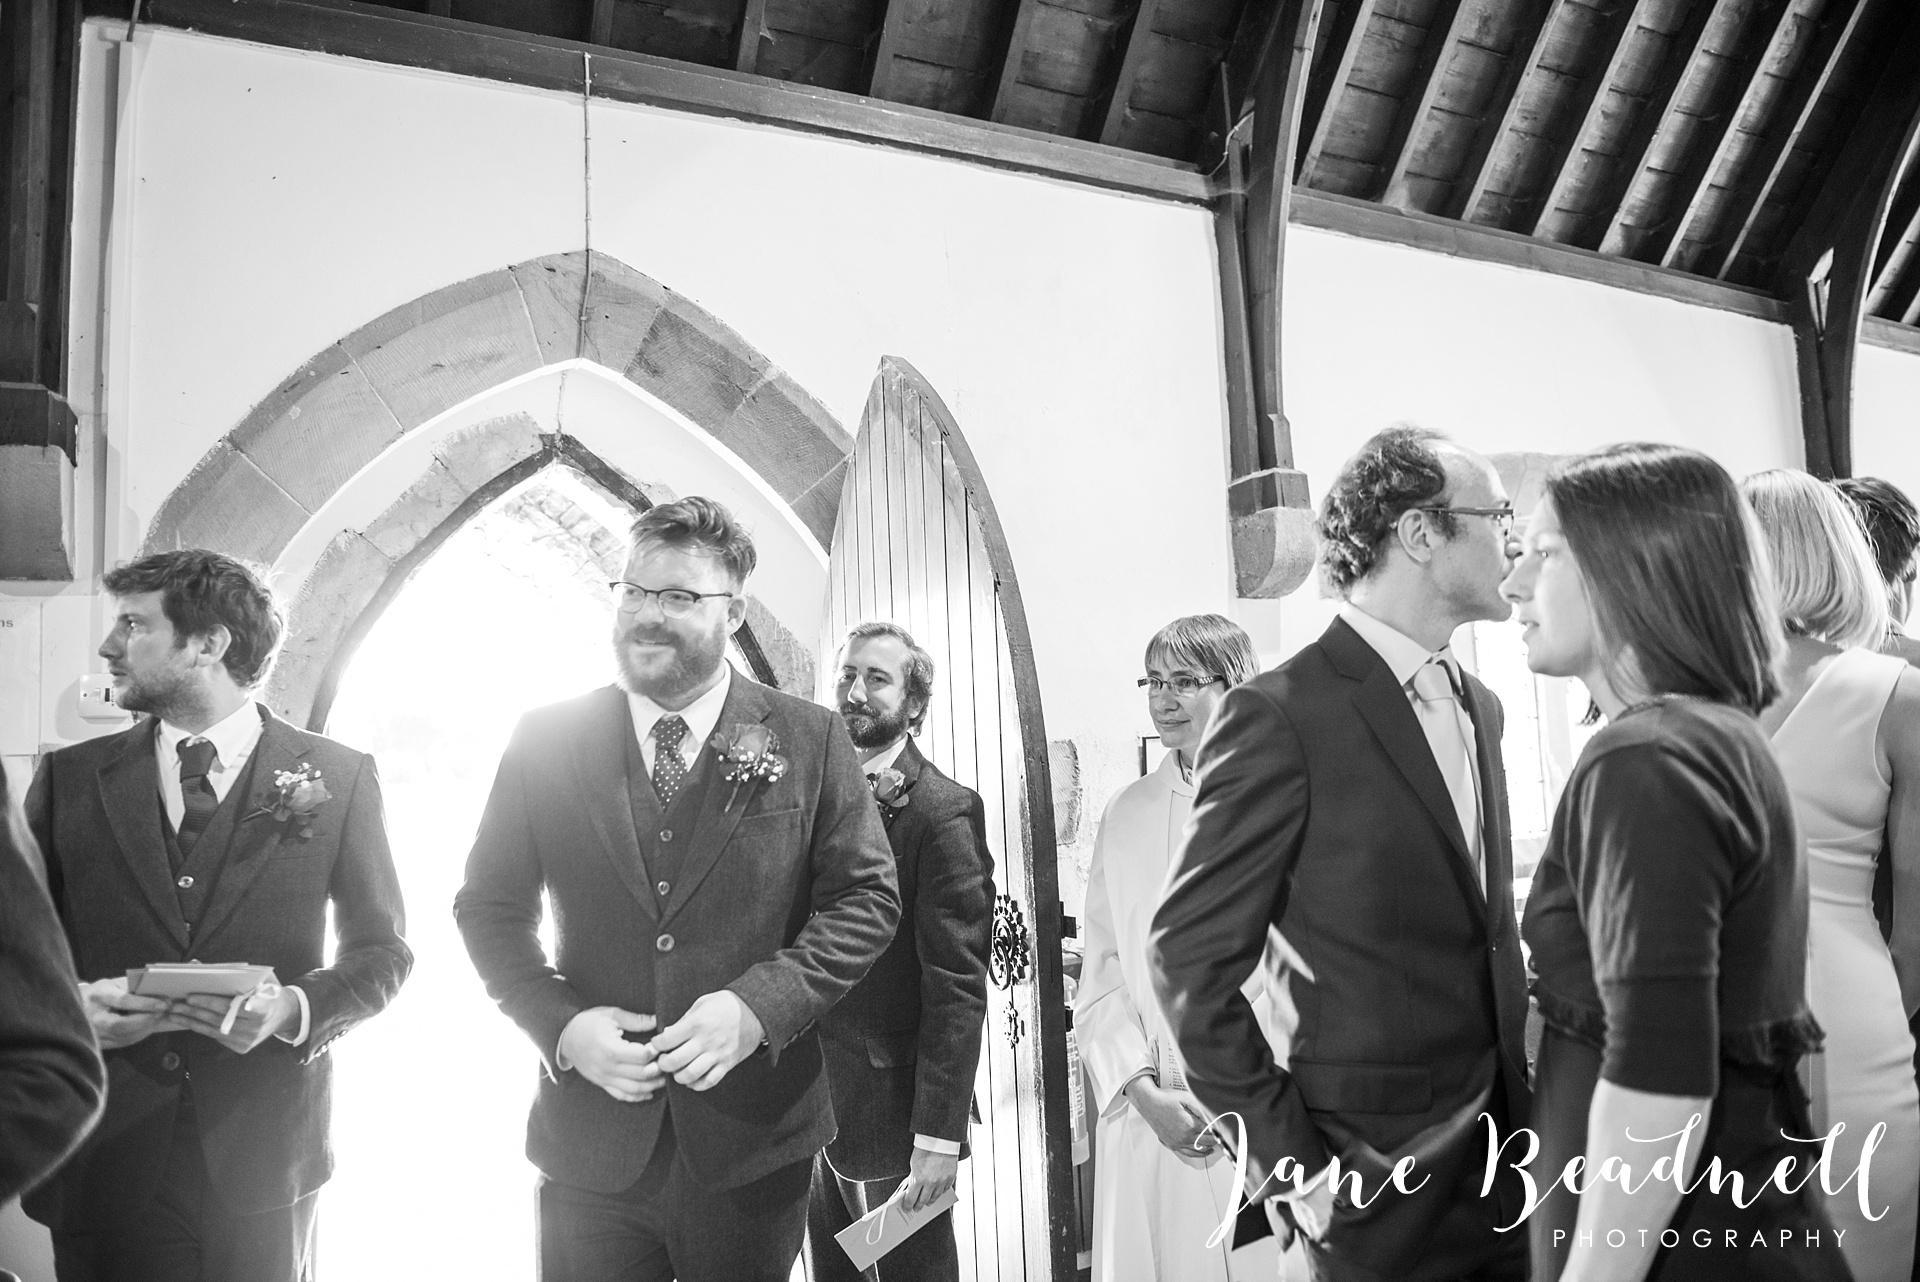 fine-art-wedding-photographer-jane-beadnell-yorkshire-wedding-photographer_0039